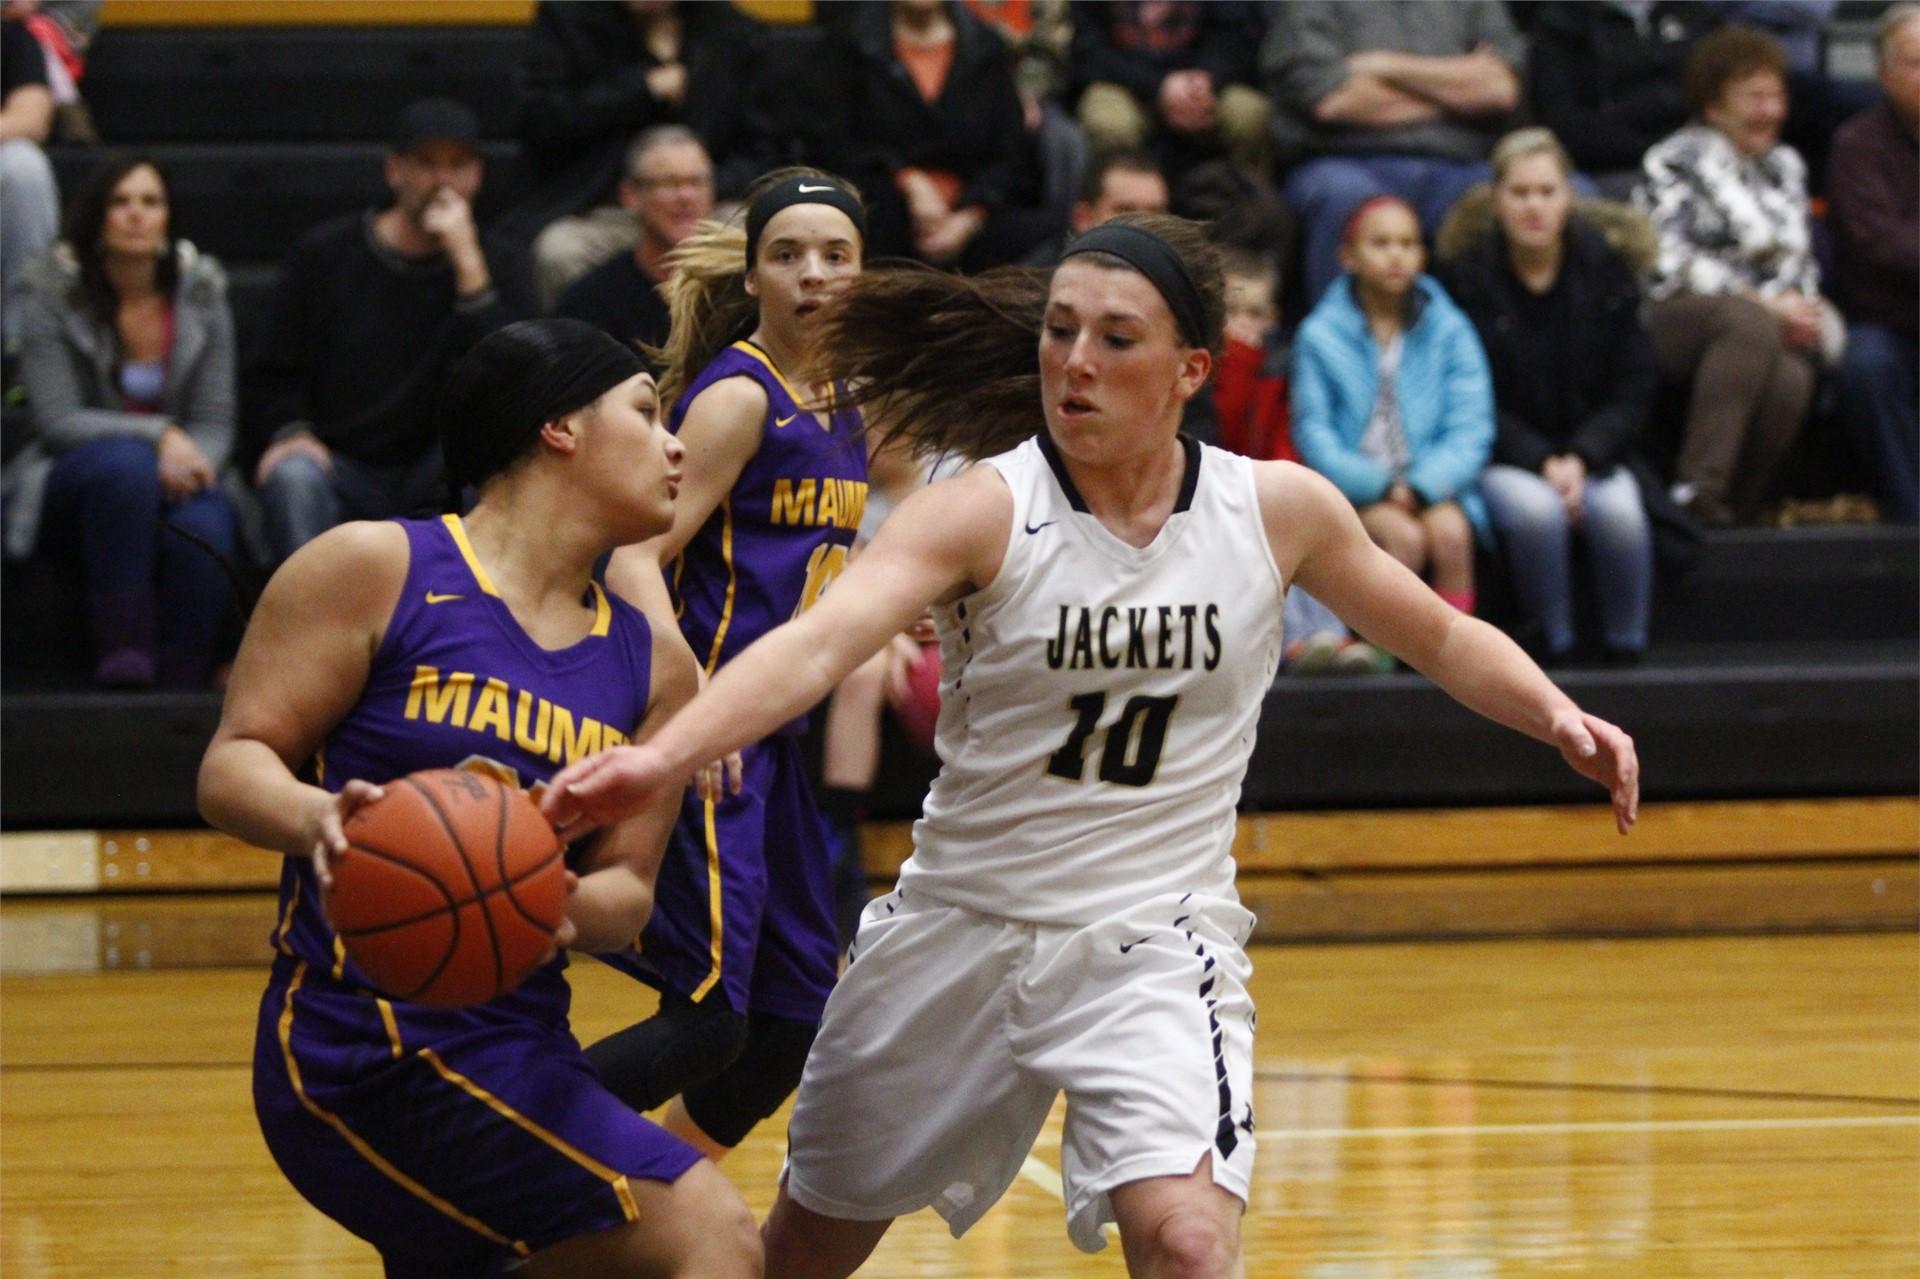 PHS student athlete defending the basketball